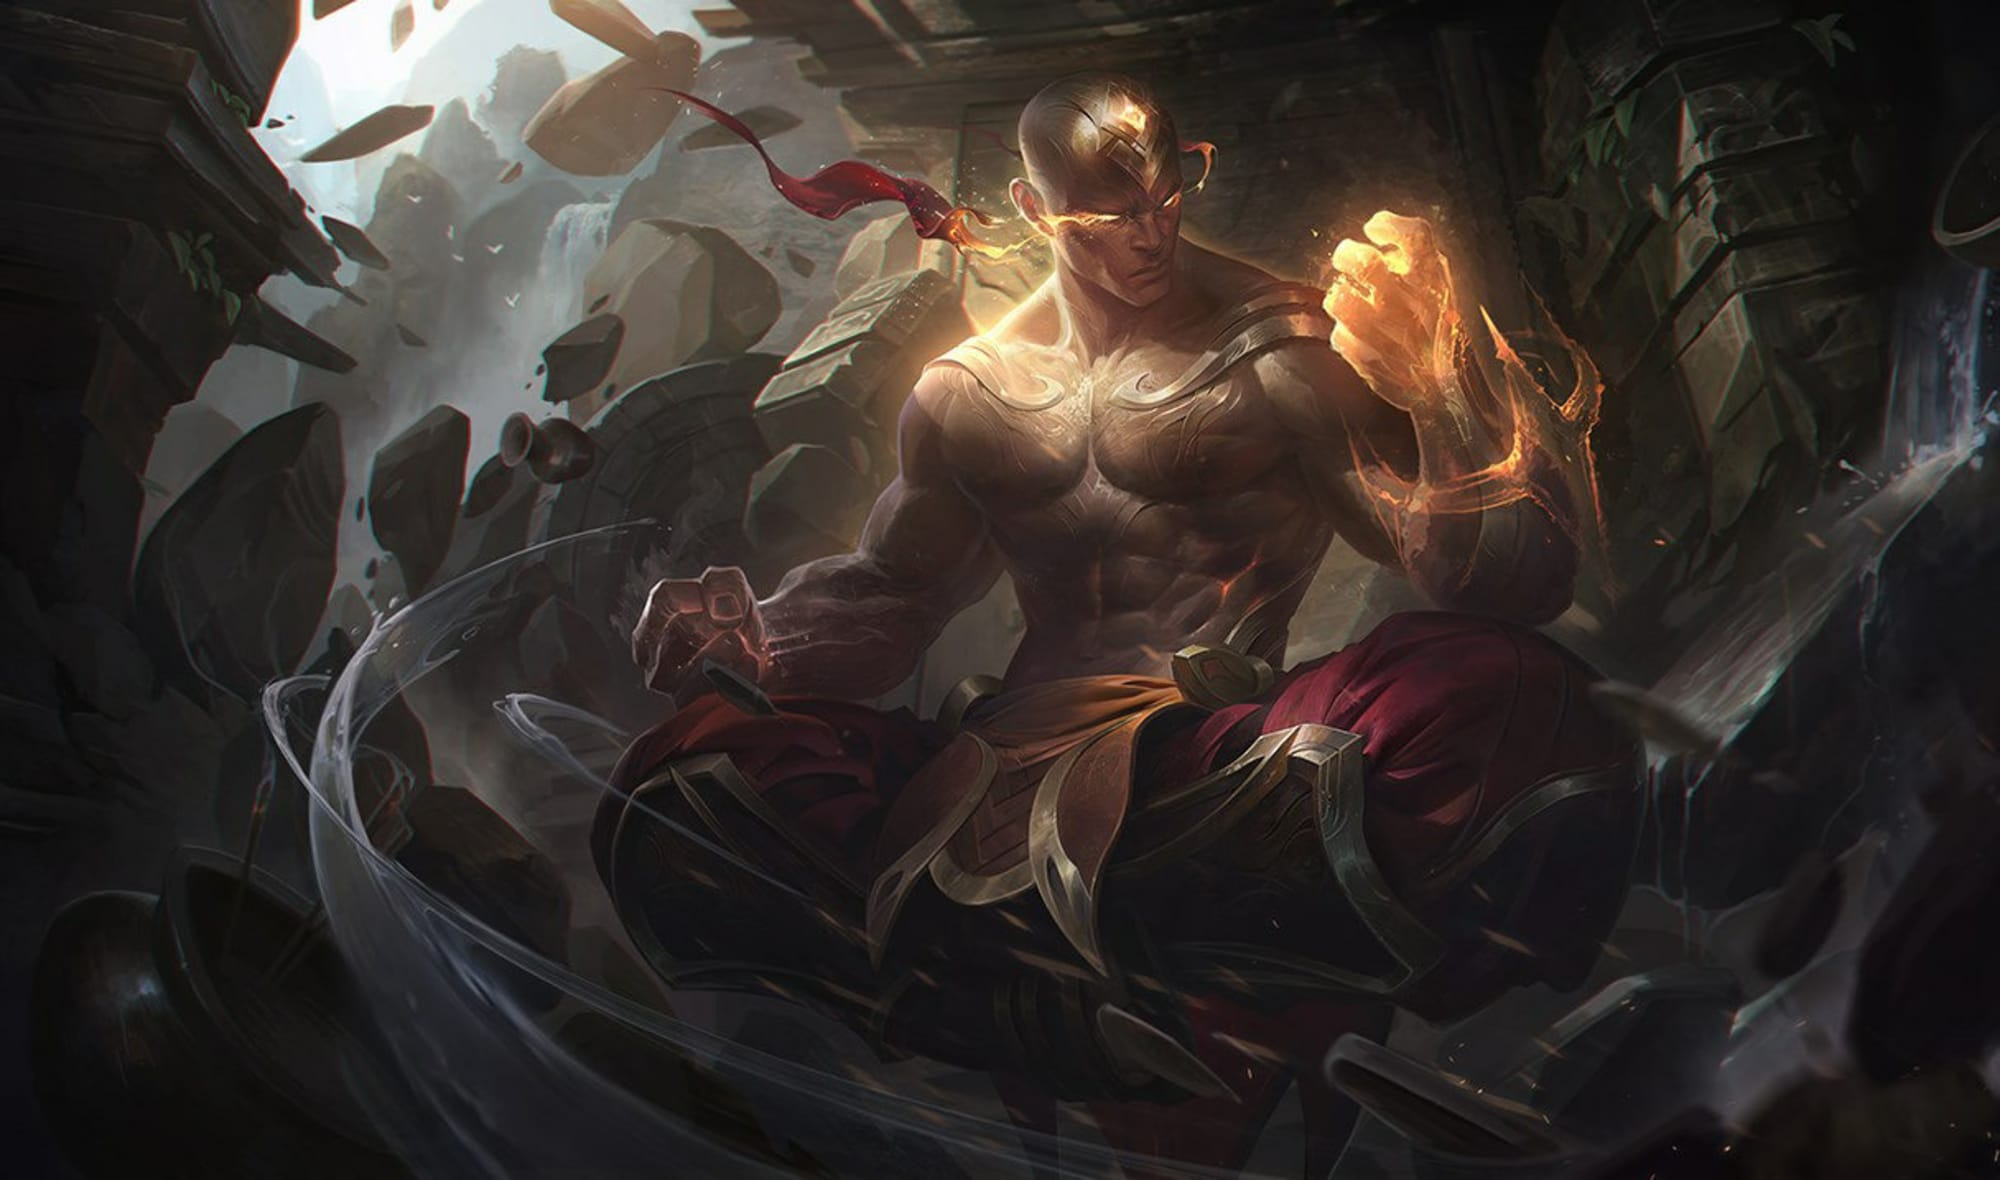 God Fist Lee Sin in League of Legends